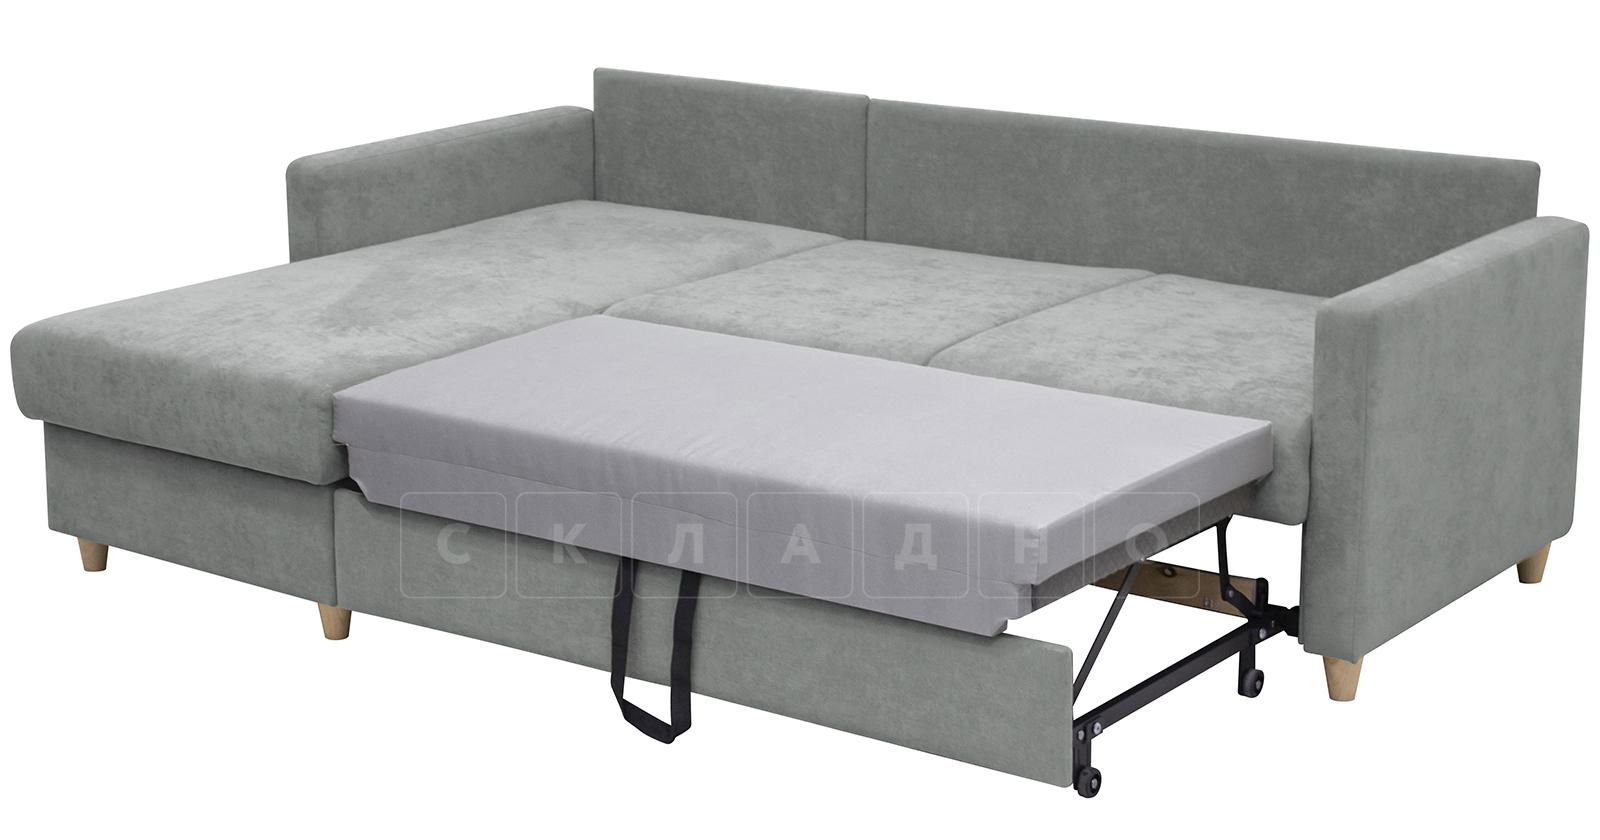 Угловой диван Дарвин серый фото 6 | интернет-магазин Складно